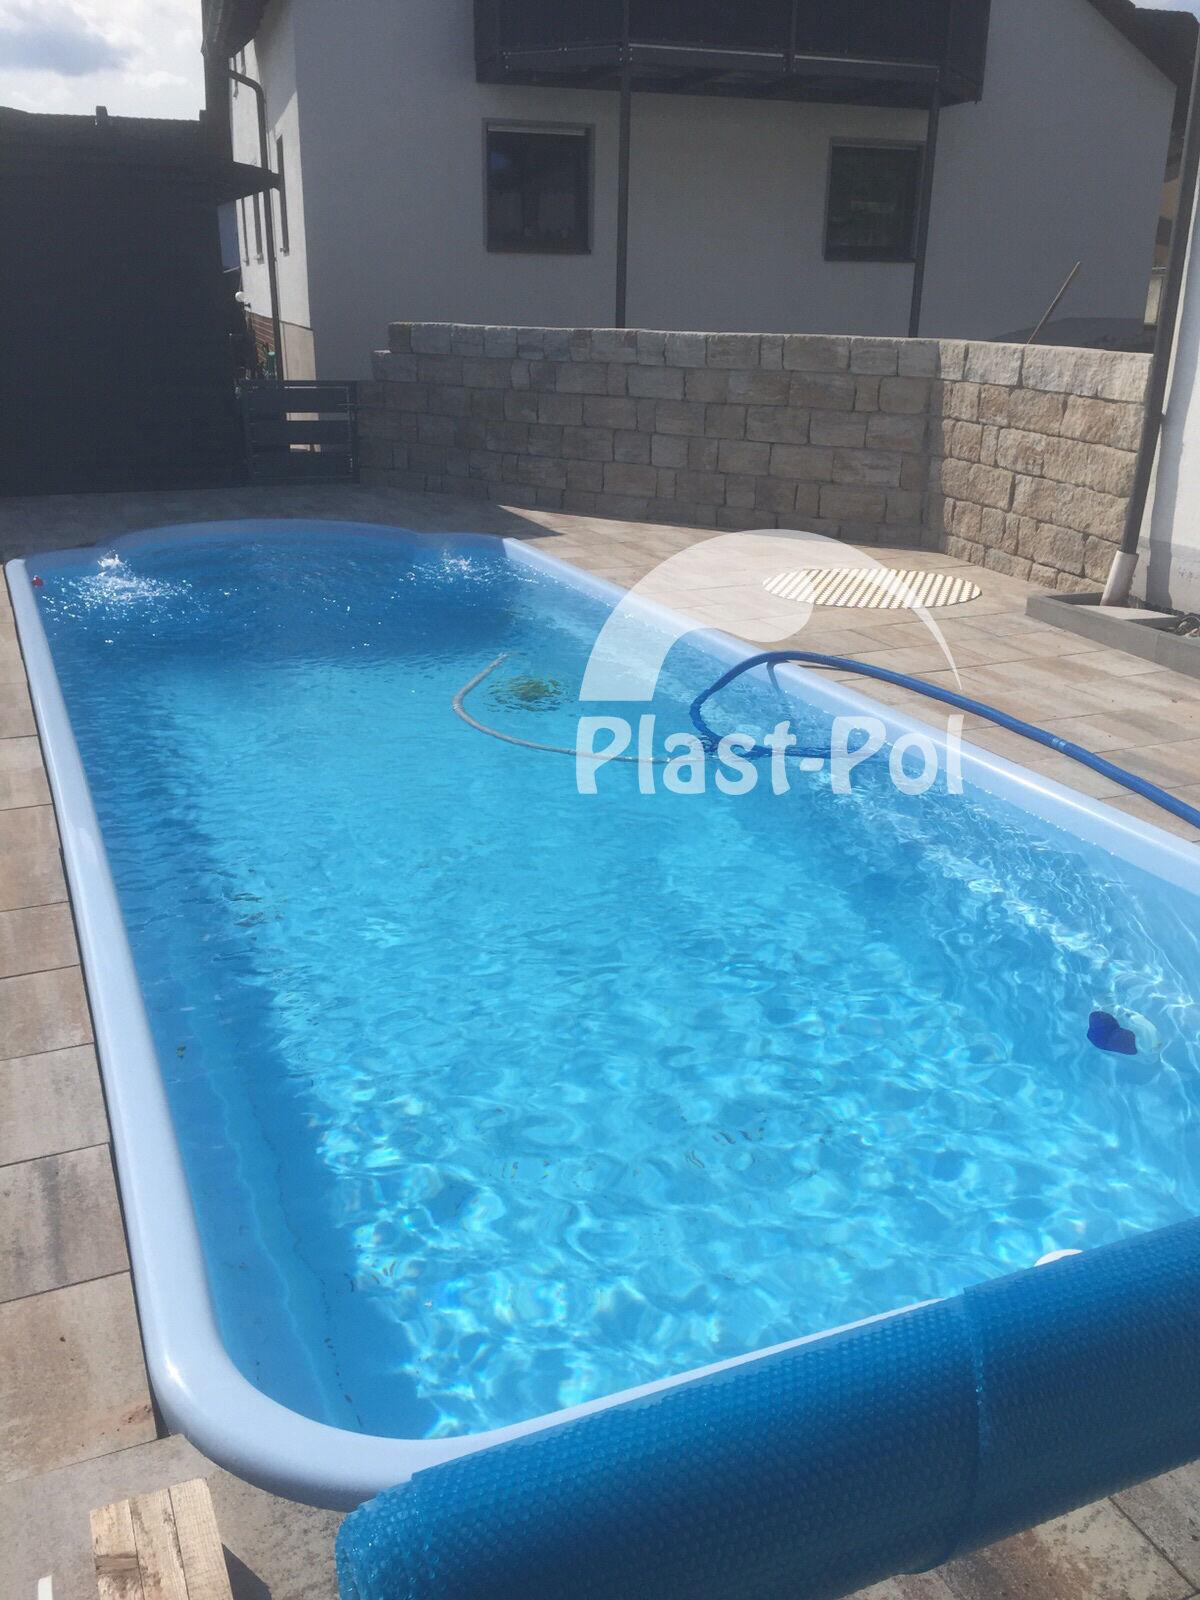 Gfk schwimmbecken swimming pool 10 00x3 20x1 50 for Fertigbecken pool